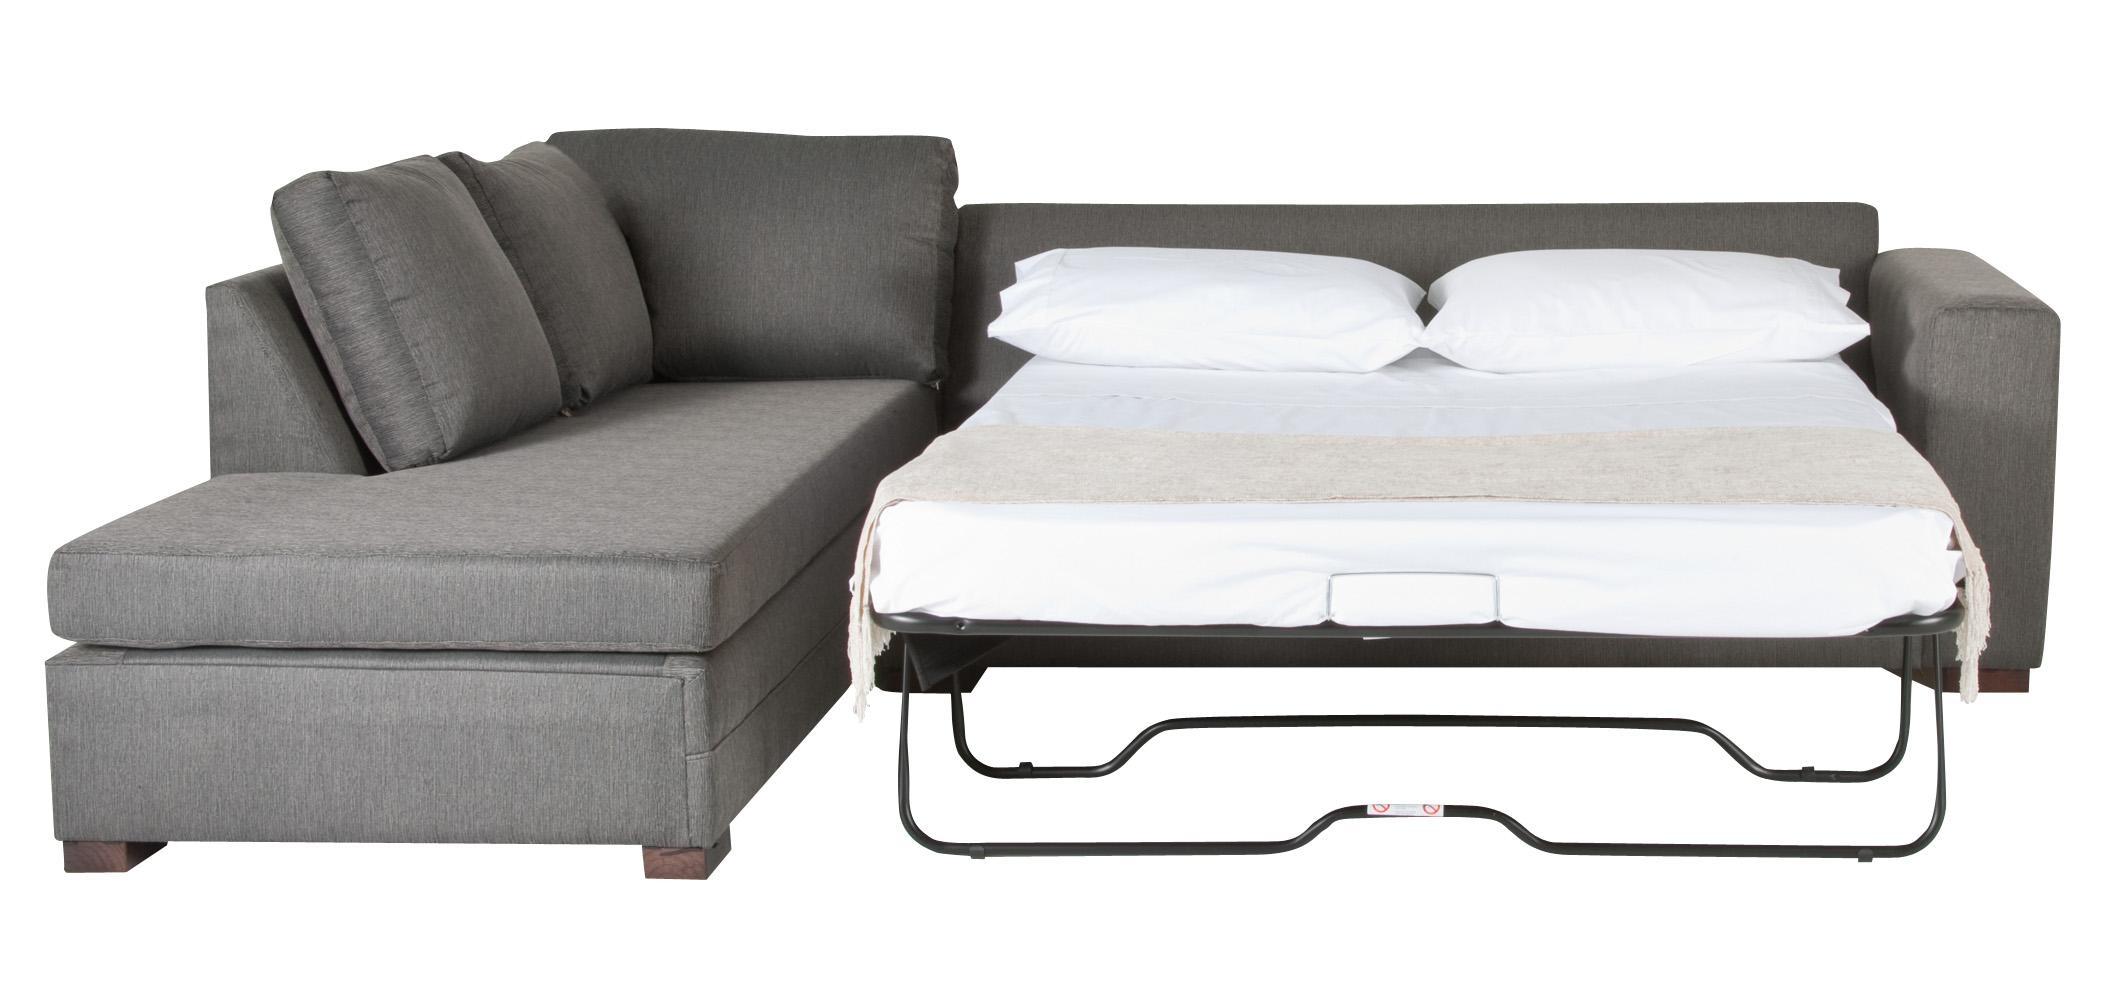 Most Comfortable Sofa Sleeper – Interior Design Inside Most Comfortable Sofabed (View 12 of 22)